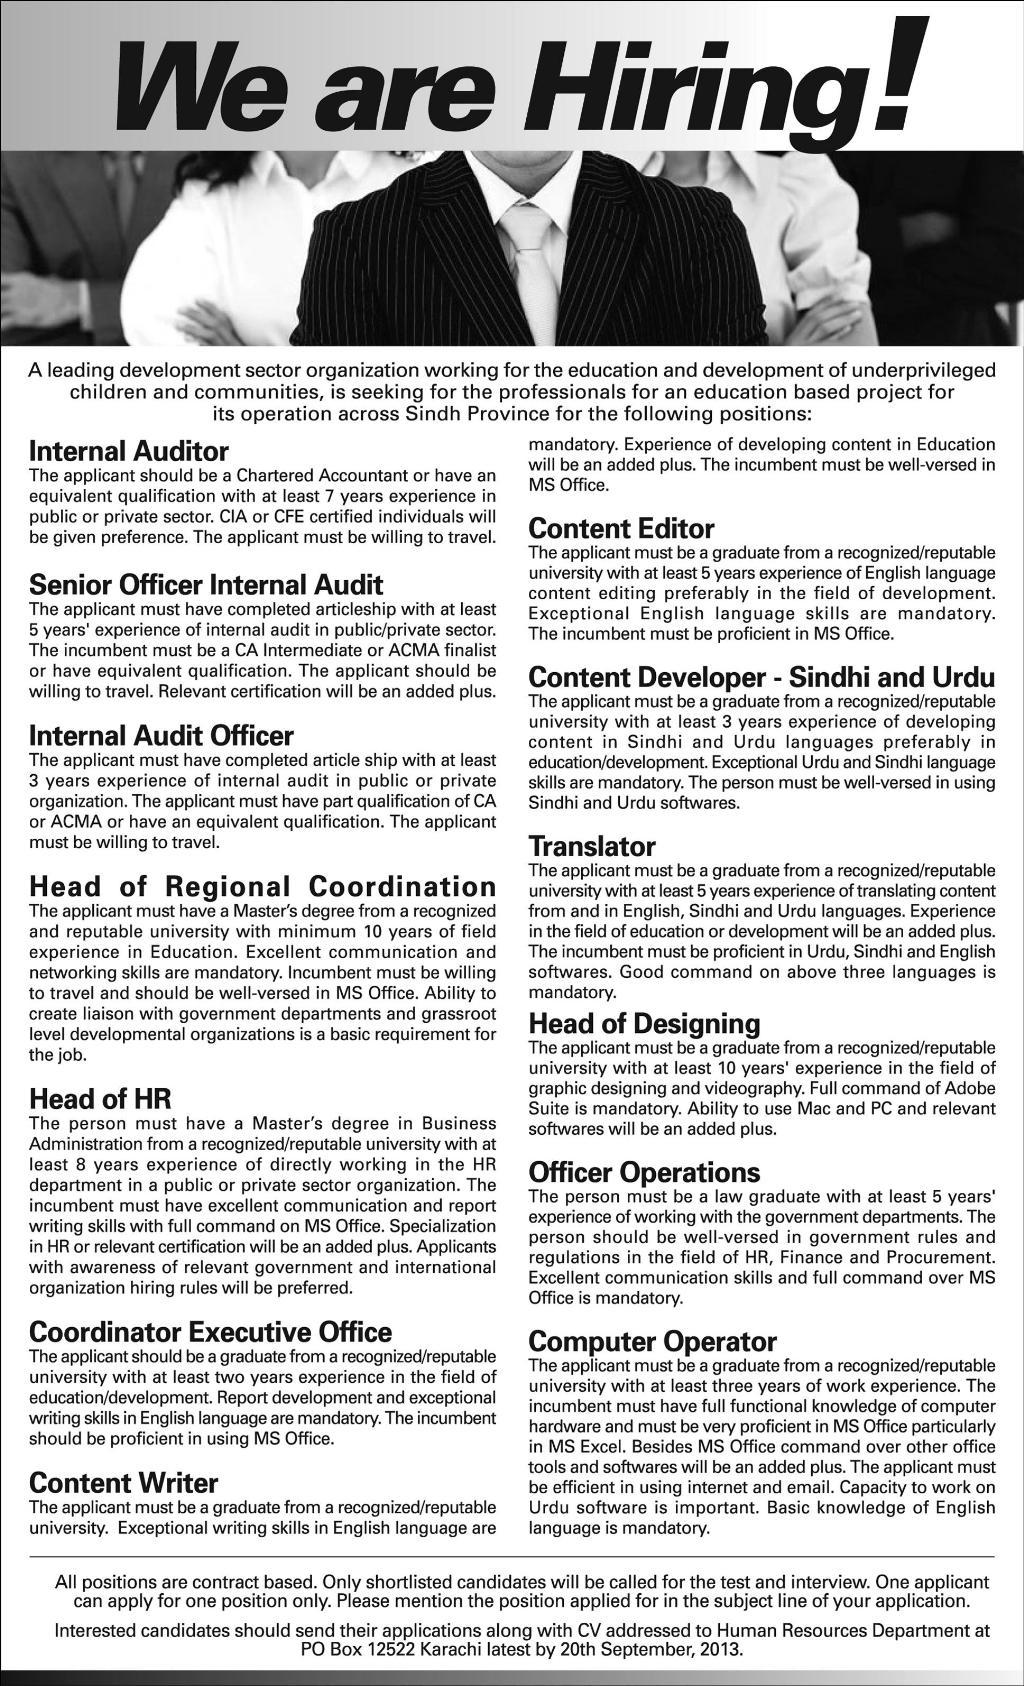 Jobs in Karachi of Auditor, Senior Officer Internal Auditor & Translator